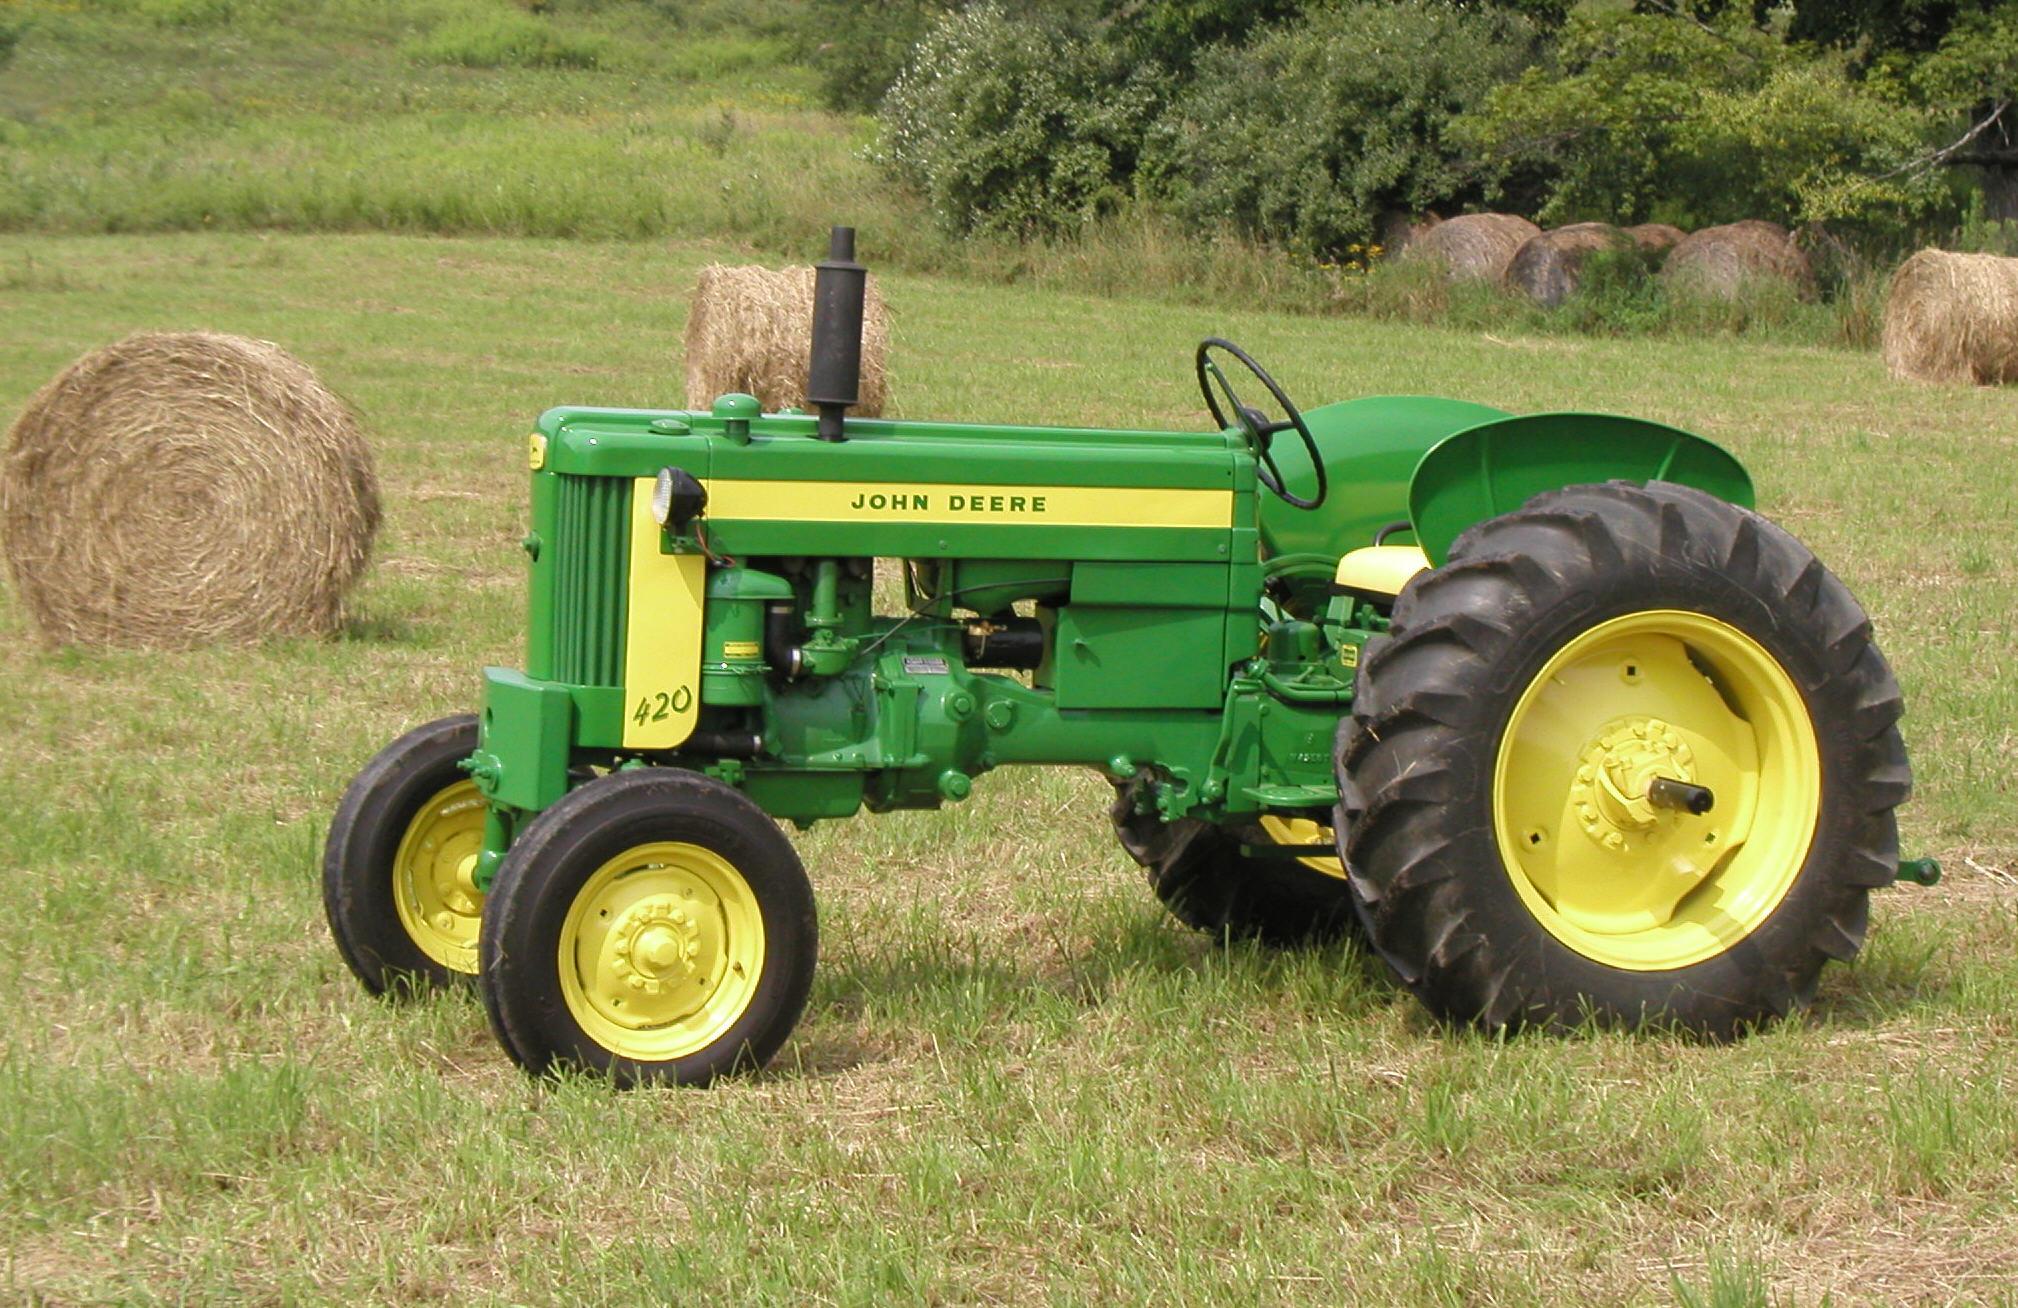 1969 john deere 140 wiring diagram porsche 996 radio 420 garden tractor repower car interior design